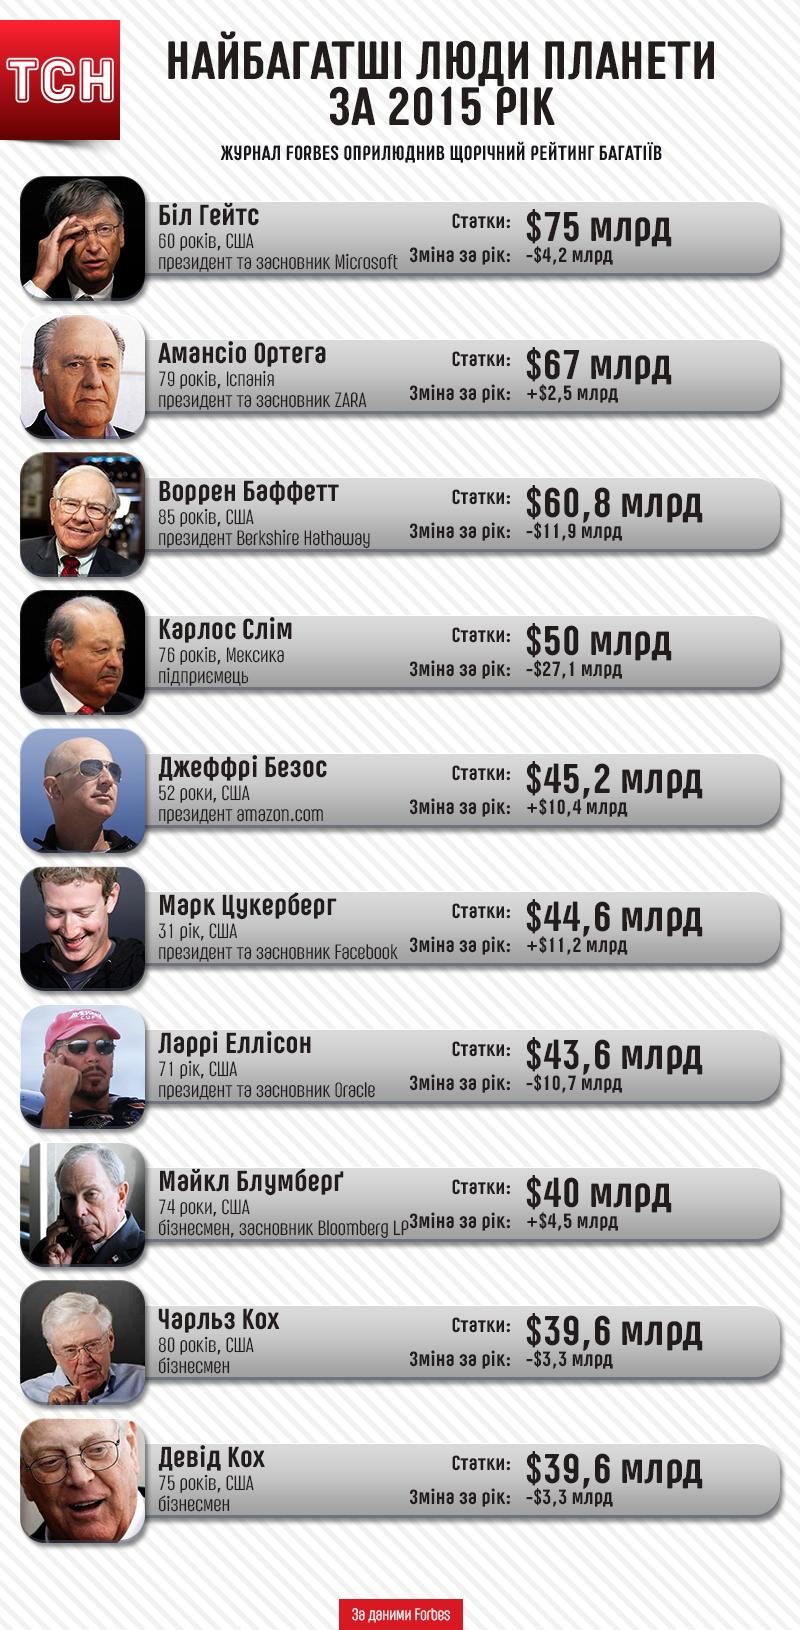 Рейтинг найбагатших людей планети